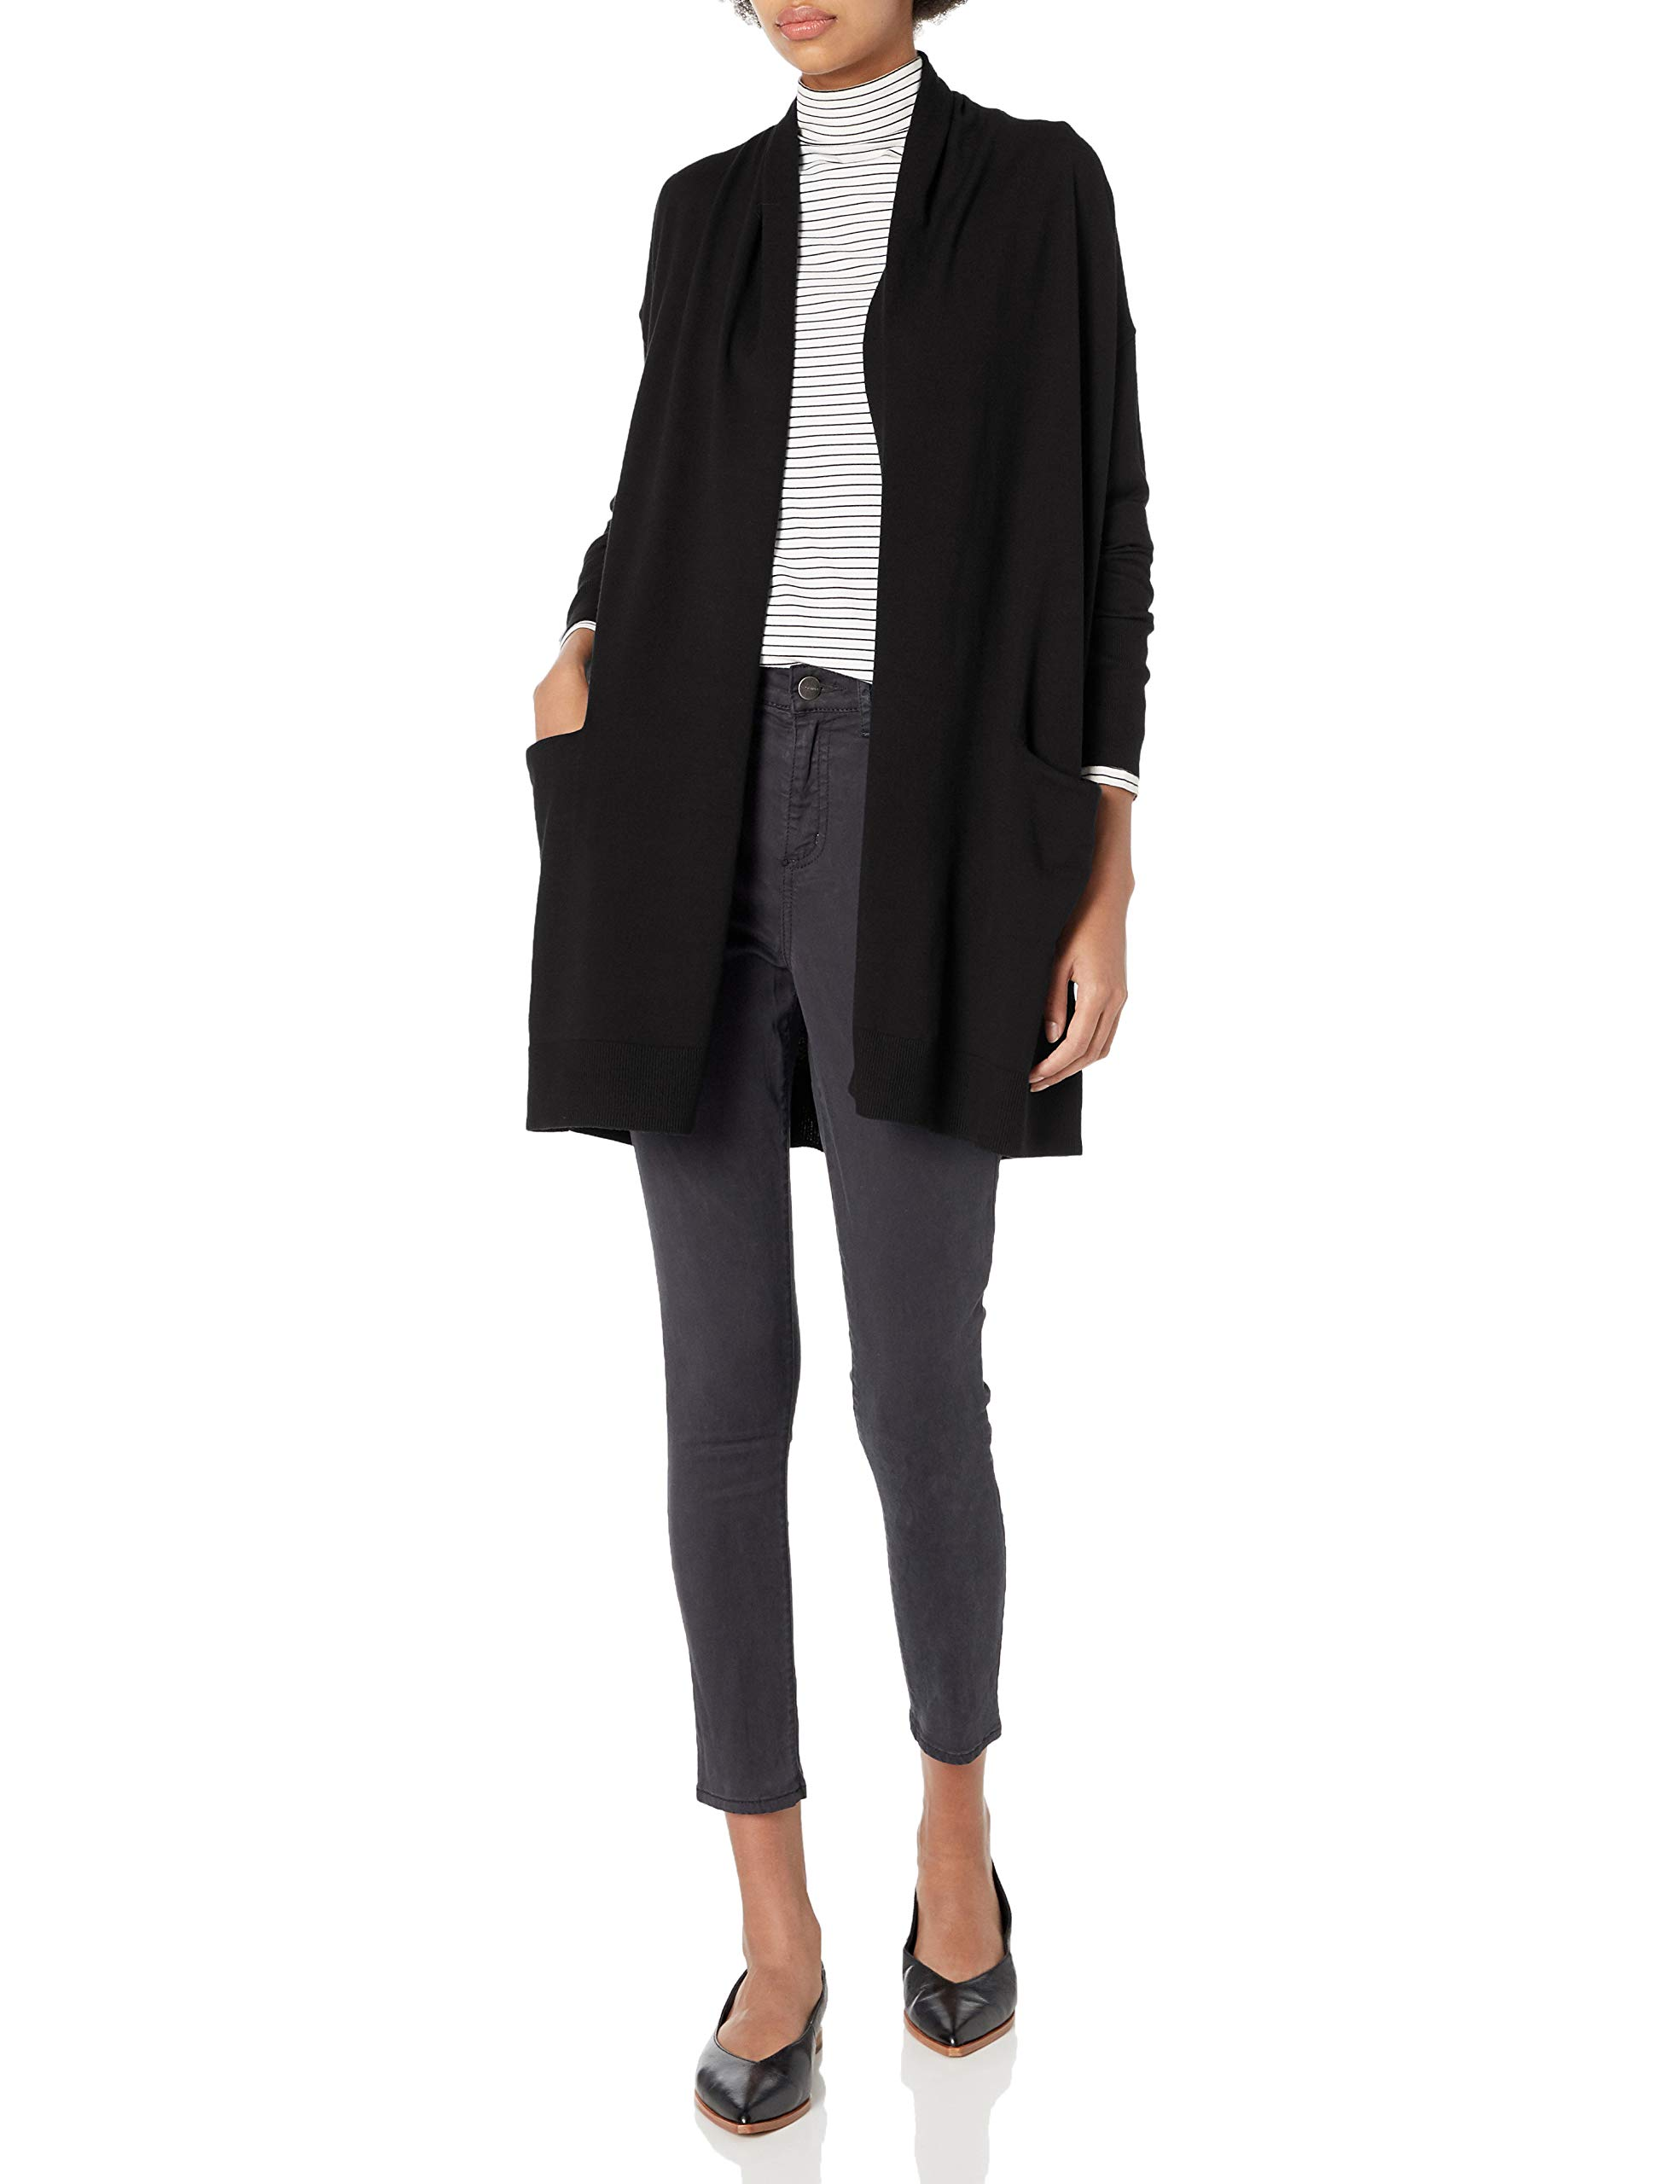 Amazon Brand - Daily Ritual Women's Fine Gauge Stretch Cardigan Sweater